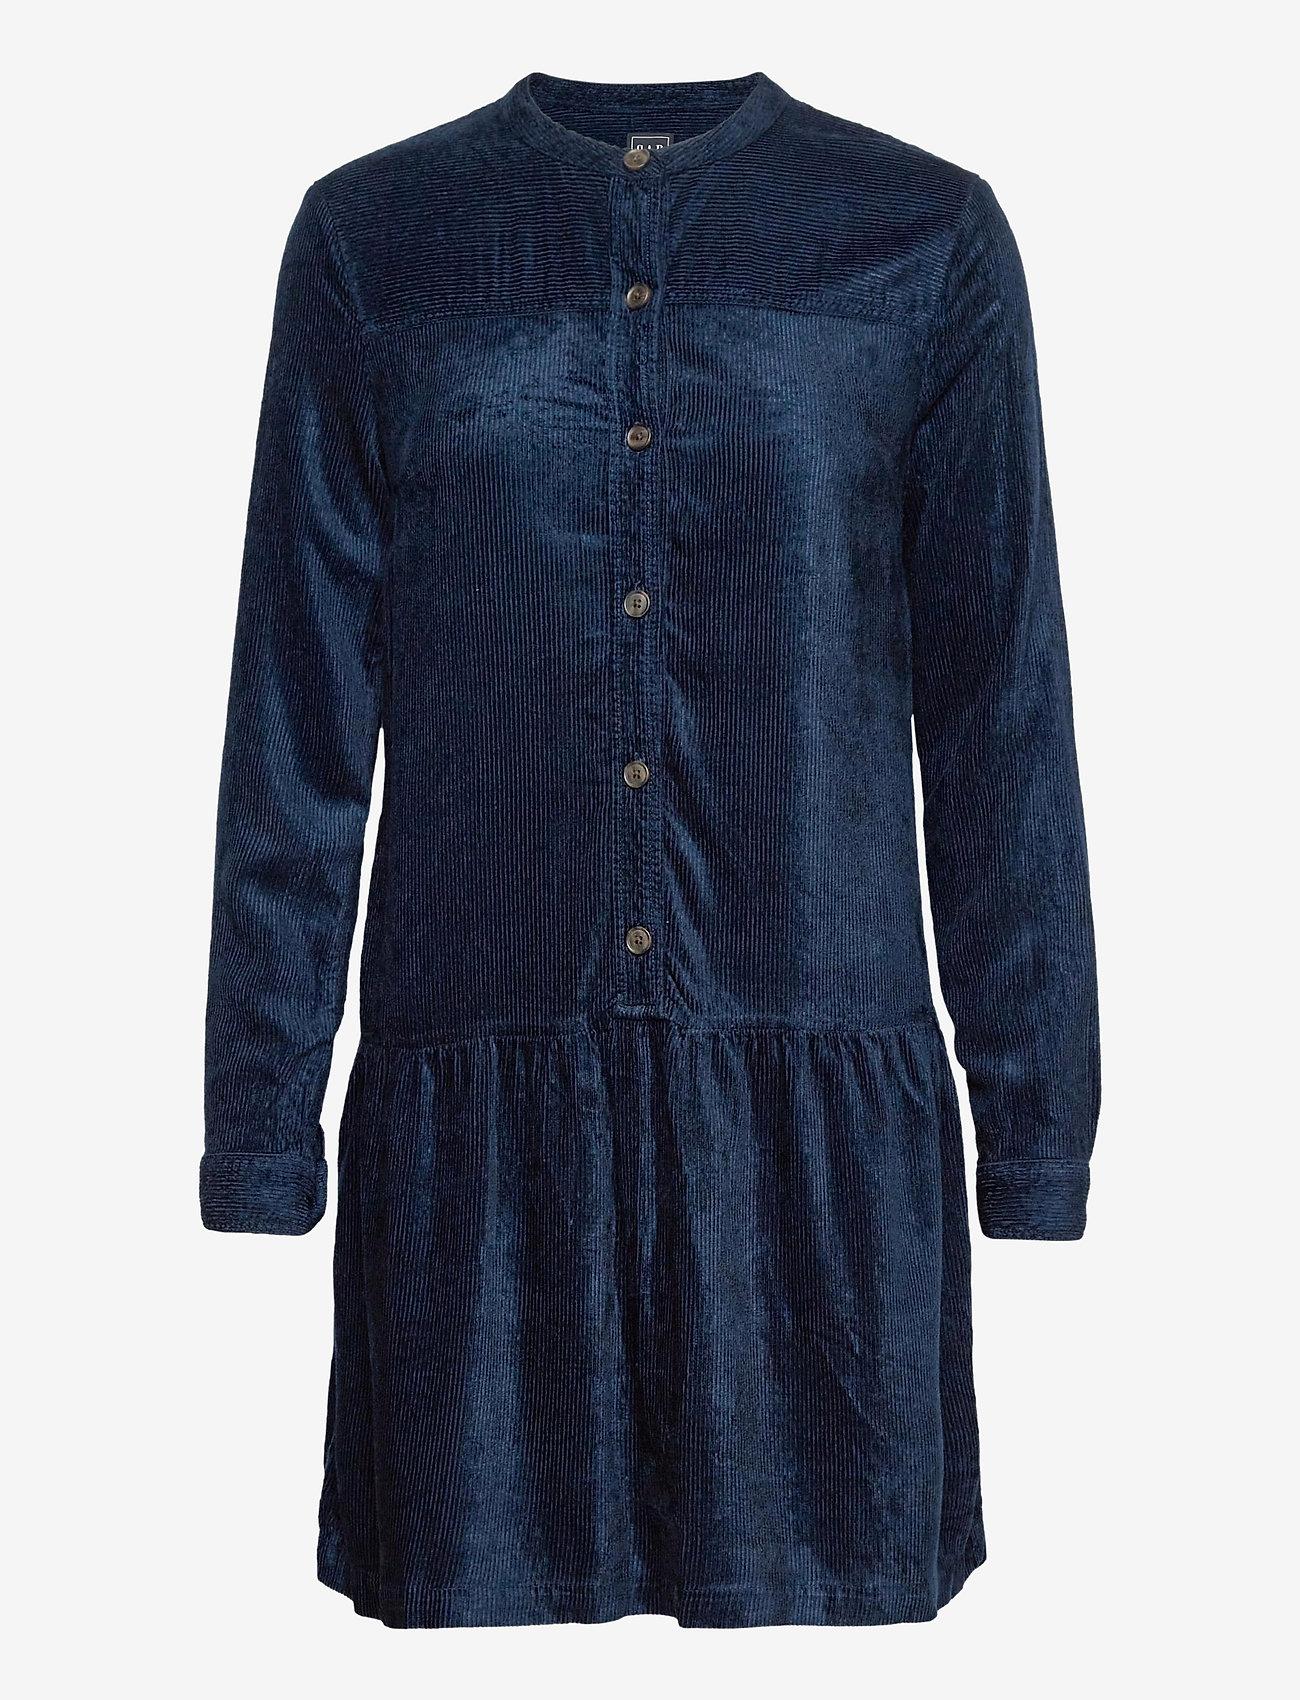 GAP - Corduroy Shirtdress - alledaagse jurken - night - 0